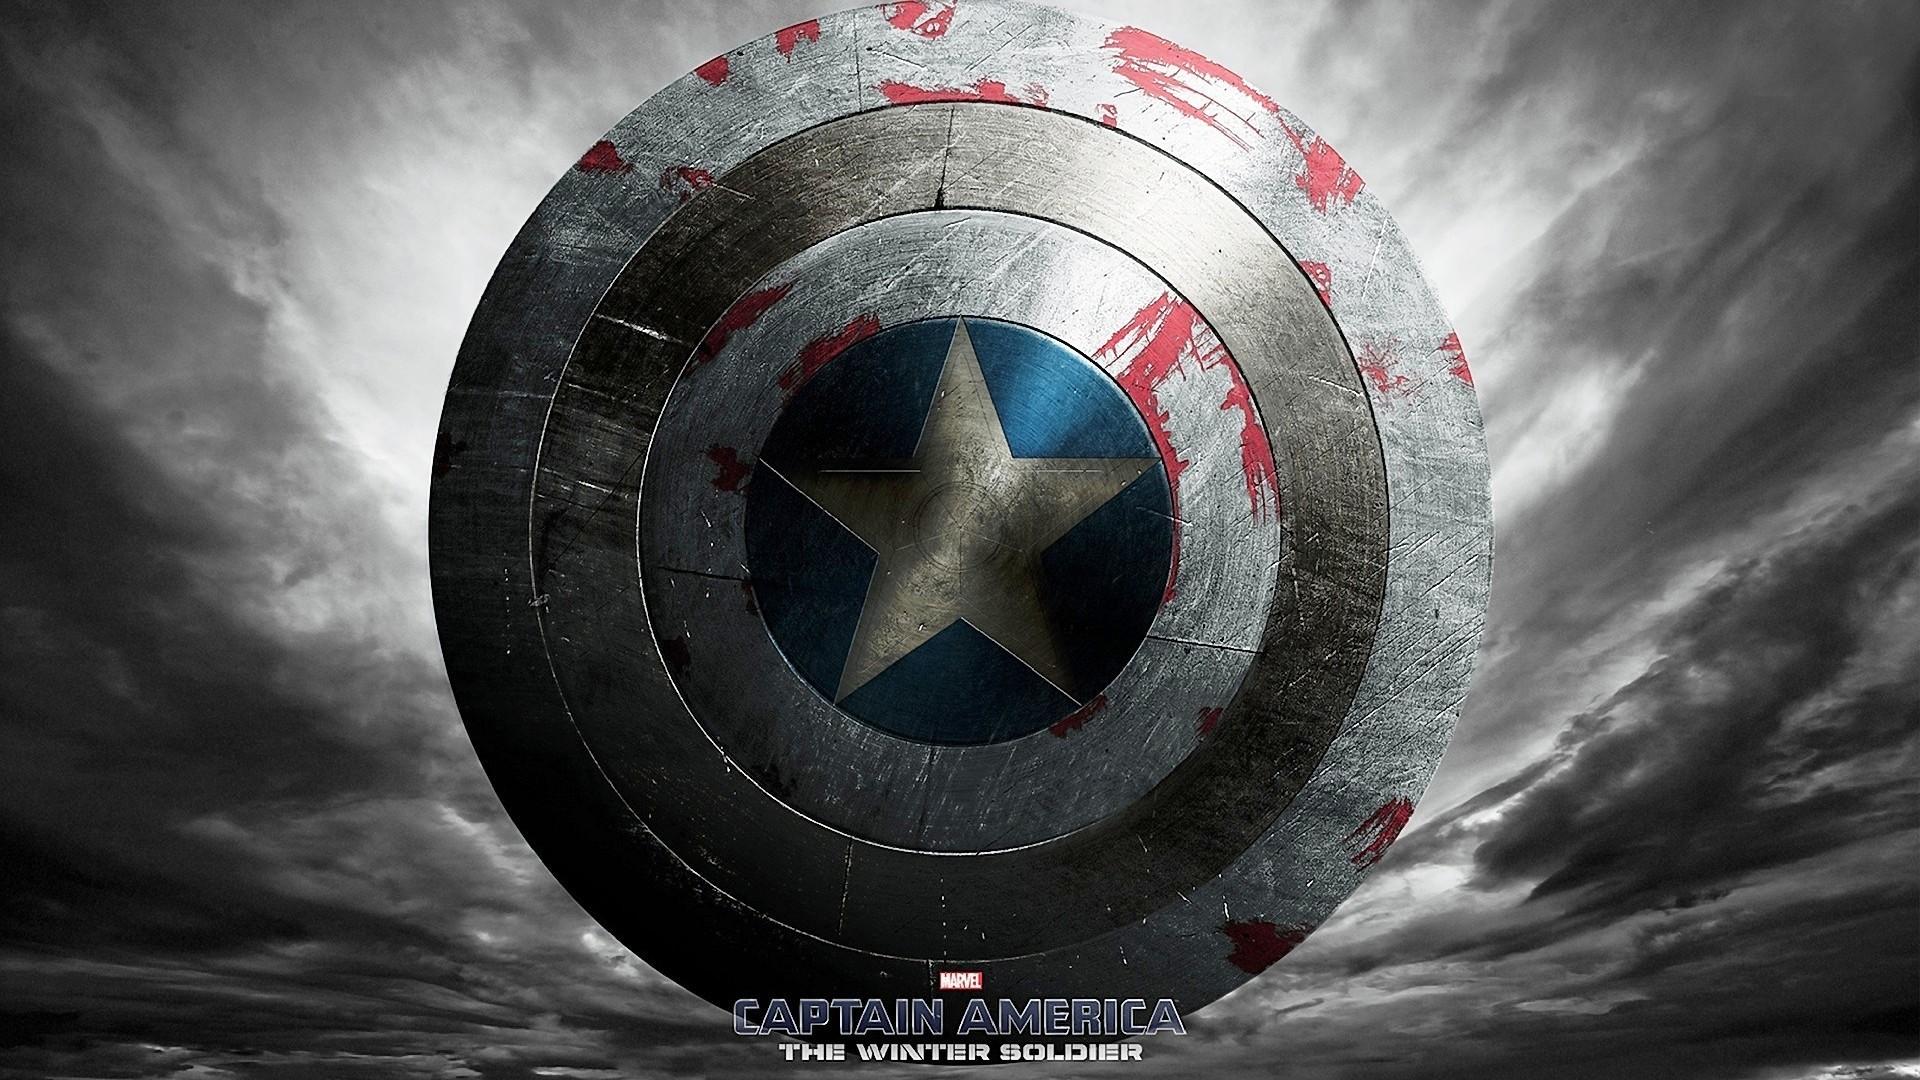 Captain America Galaxy S Wallpaper 1920×1080 Captain America Wallpaper Hd  (30 Wallpapers)